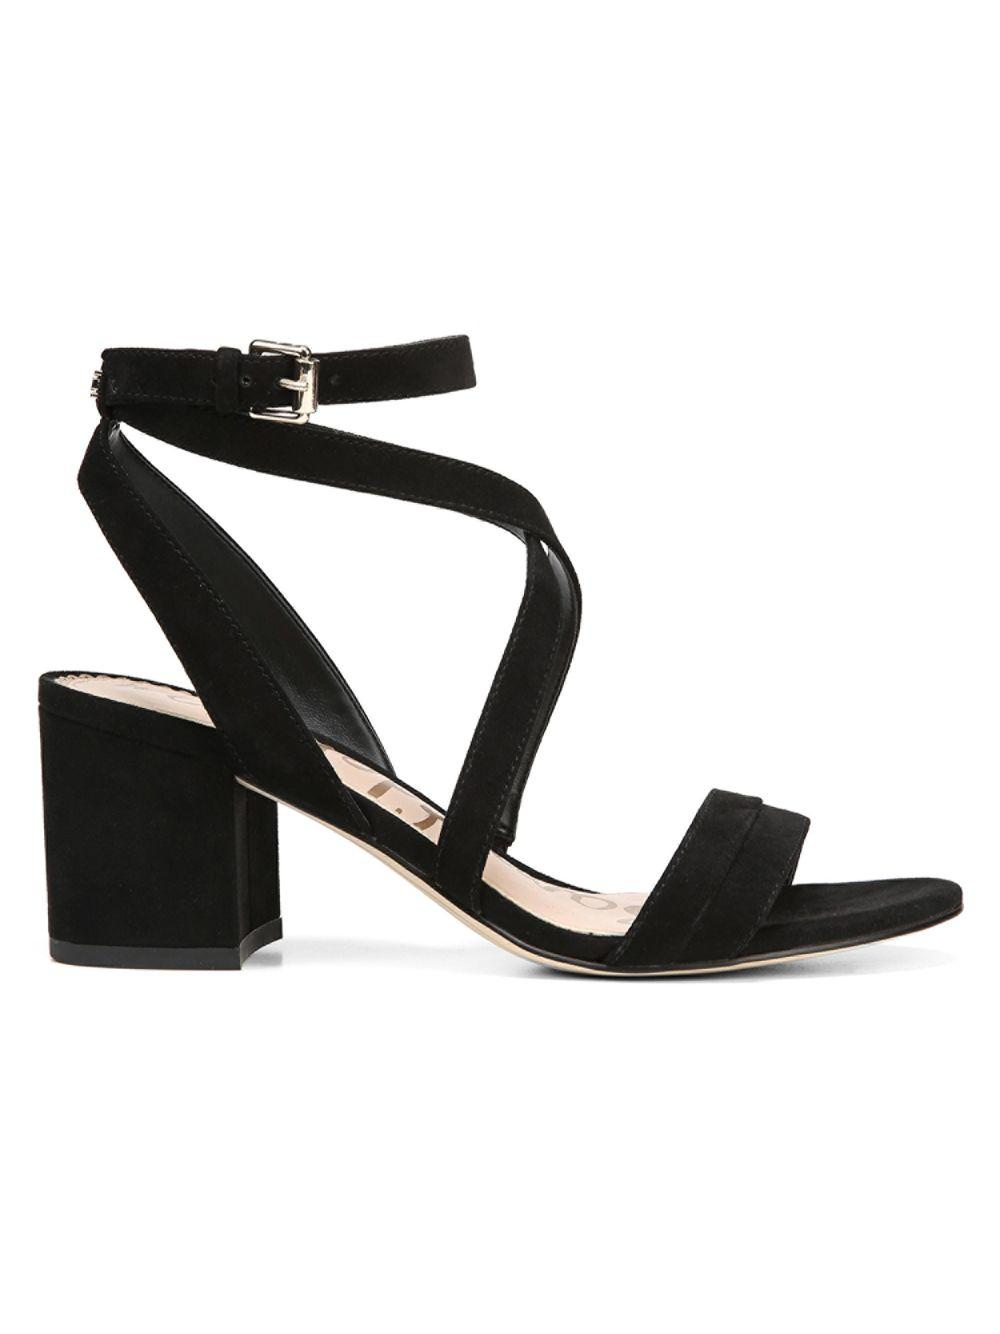 f3535b0b547 Sam Edelman Sammy Strappy Suede Sandals in Black - Save 60% - Lyst